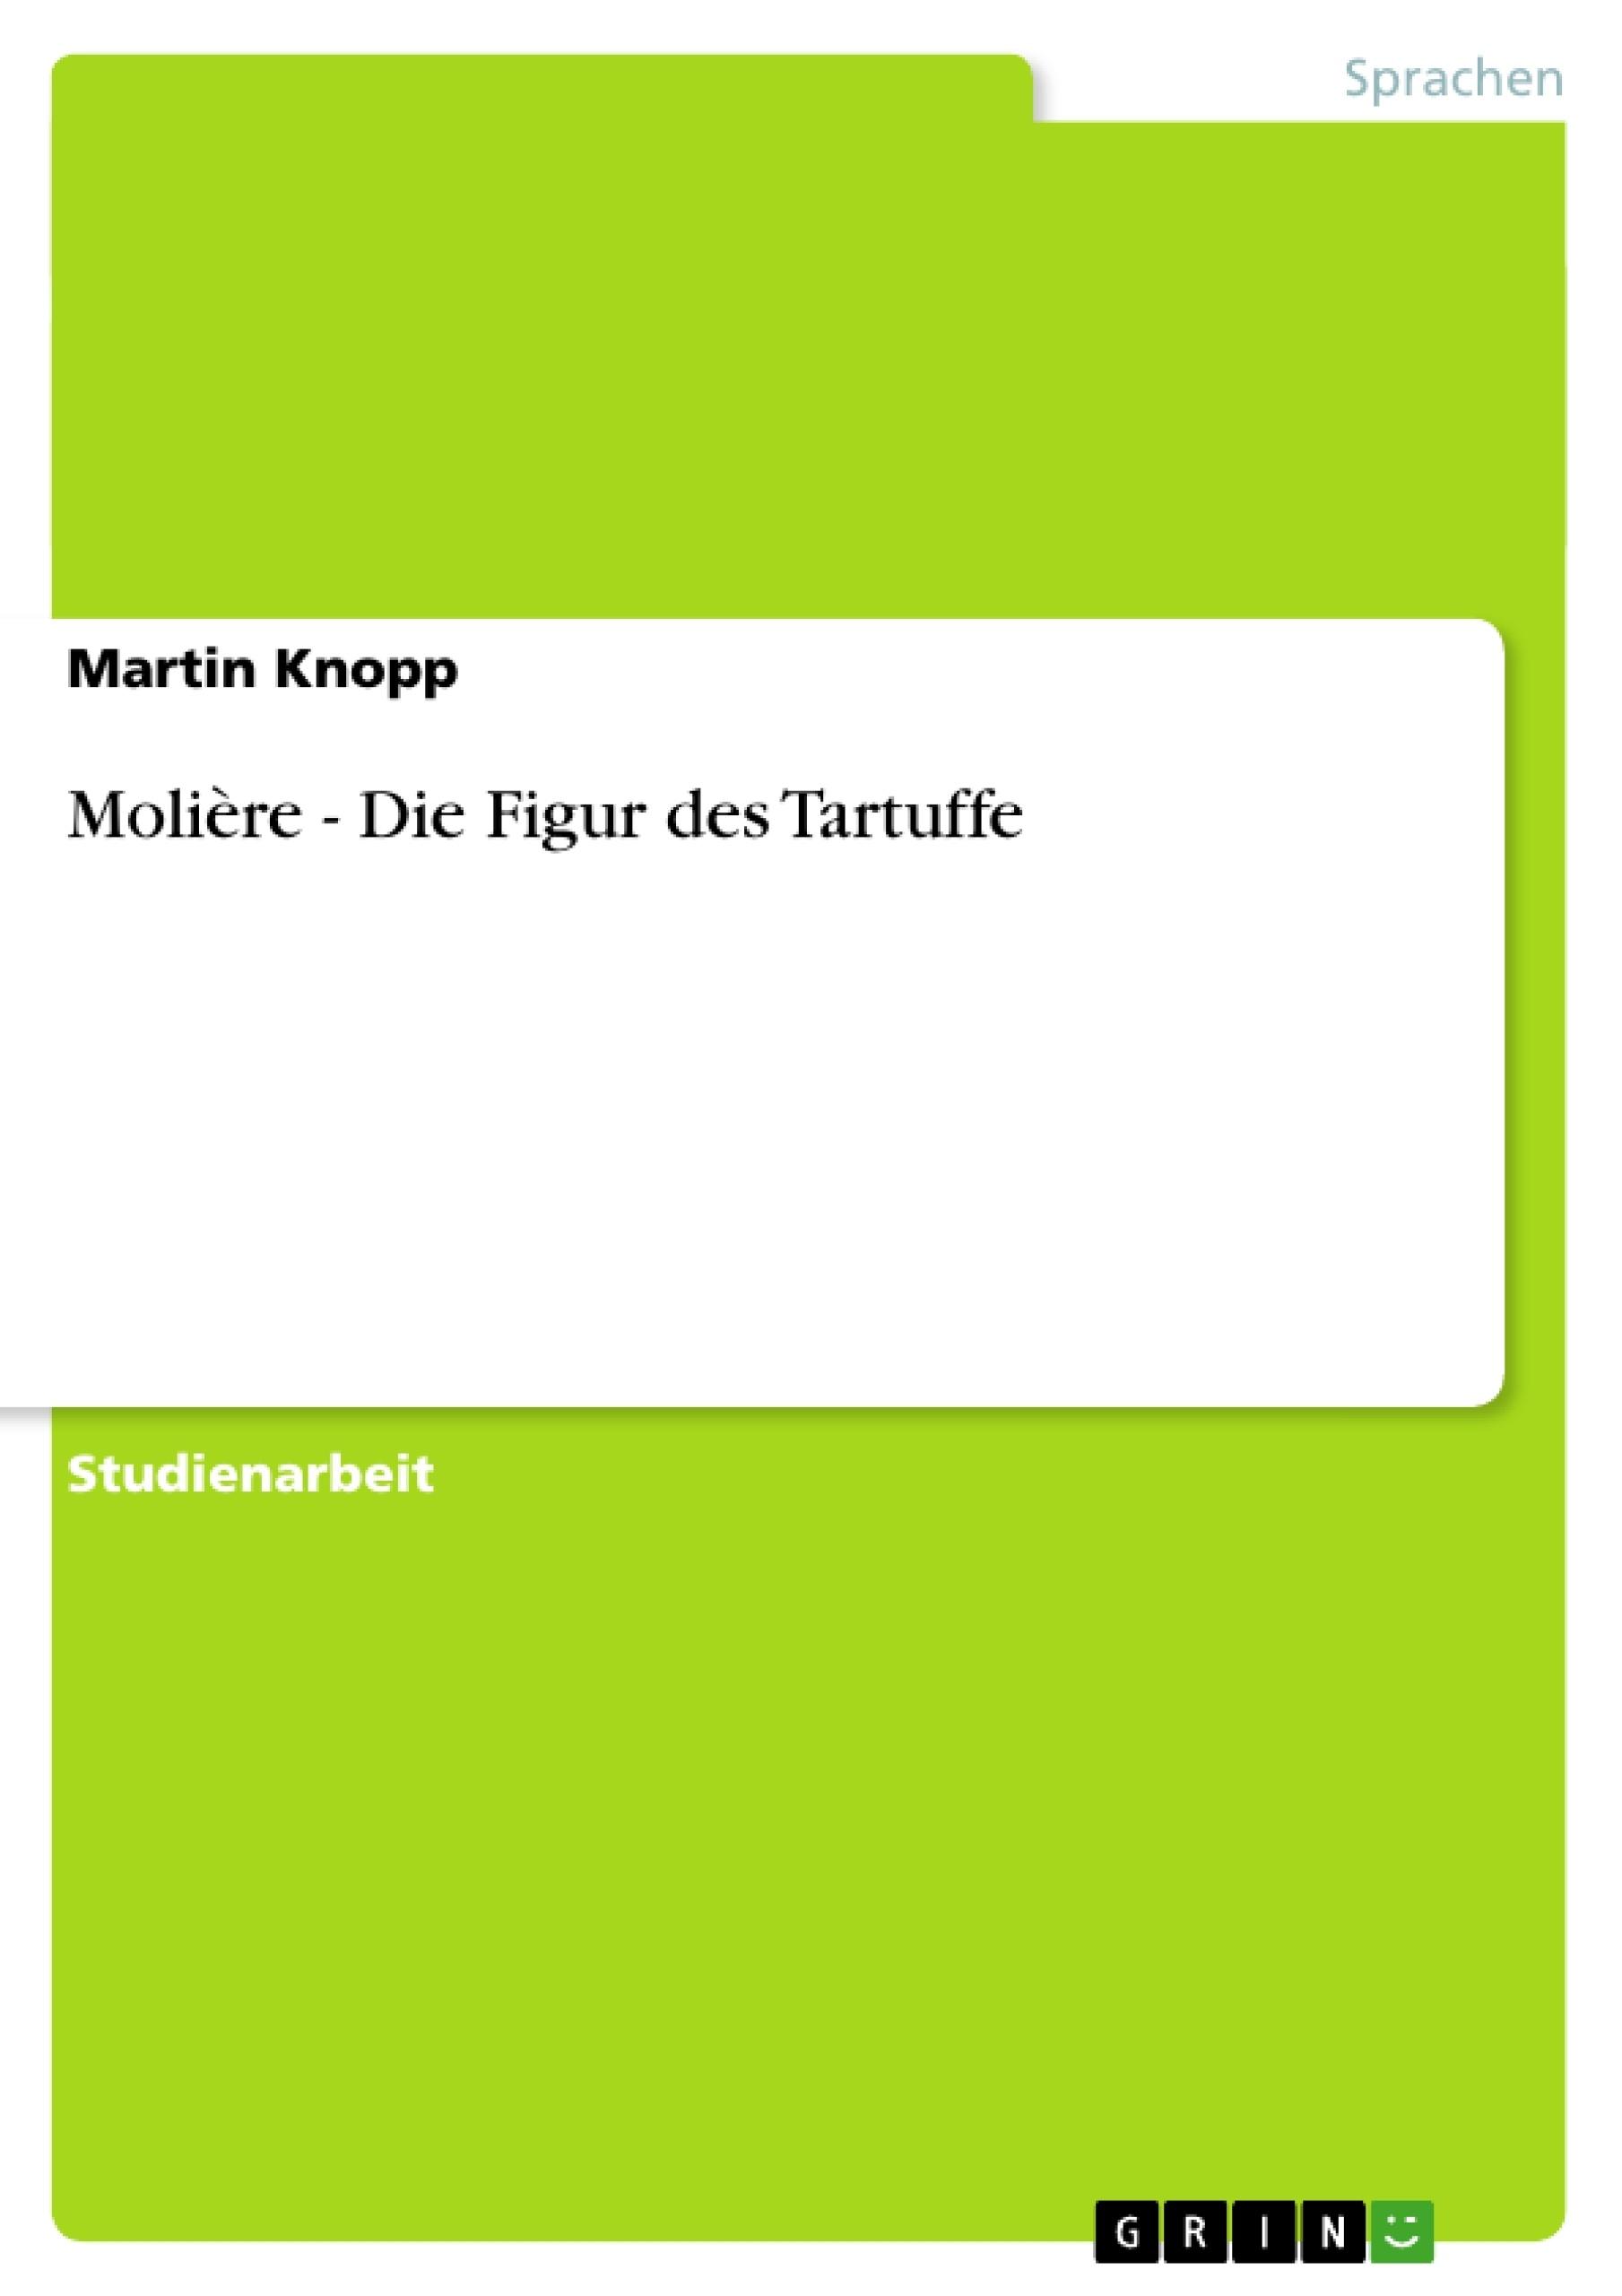 Titel: Molière - Die Figur des Tartuffe